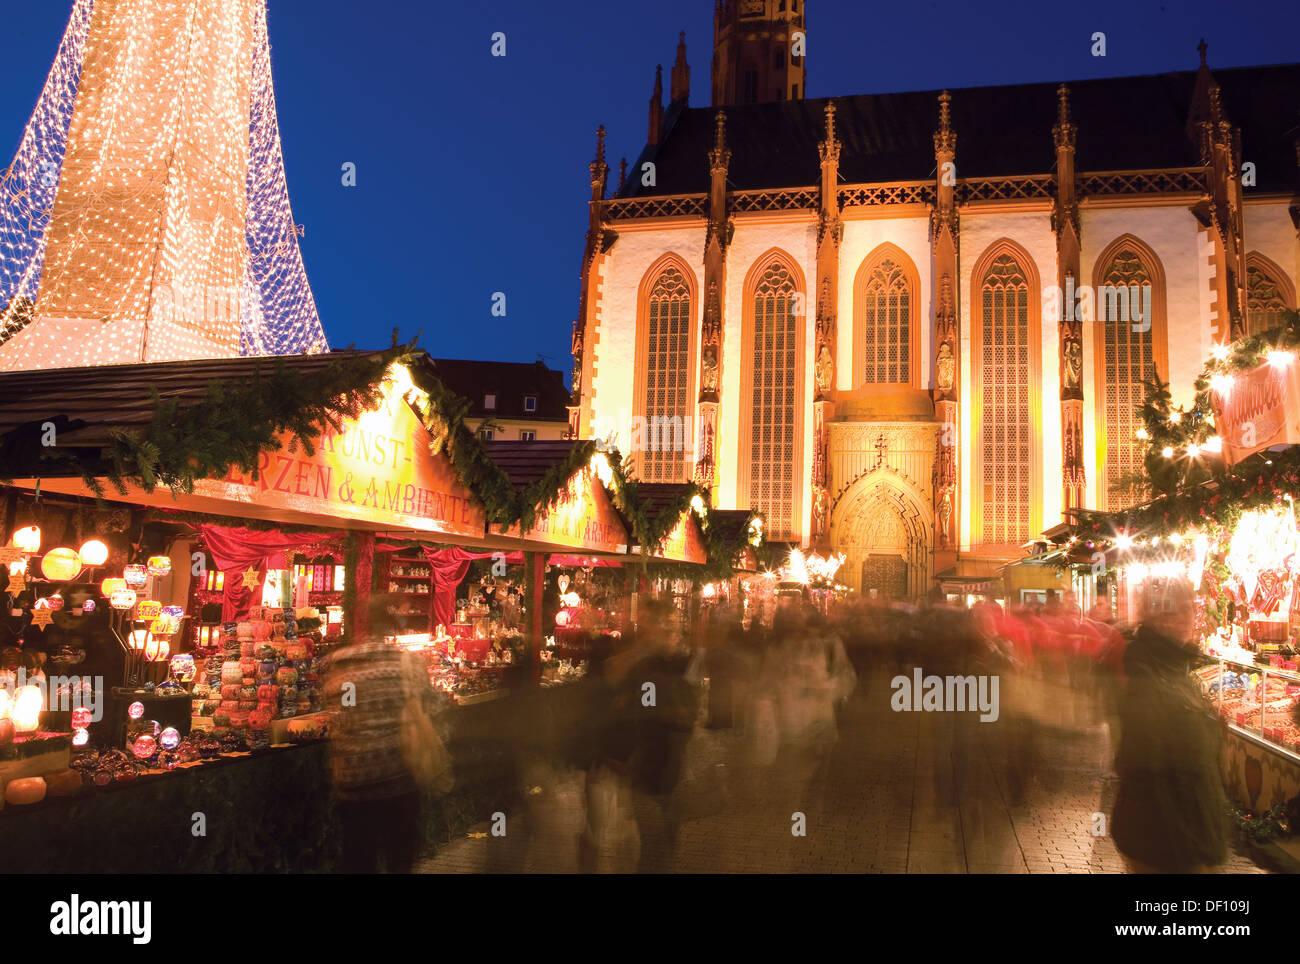 Weihnachtsmarkt Würzburg.Weihnachtsmarkt Würzburg Deutschland Stockfoto Bild 60873166 Alamy